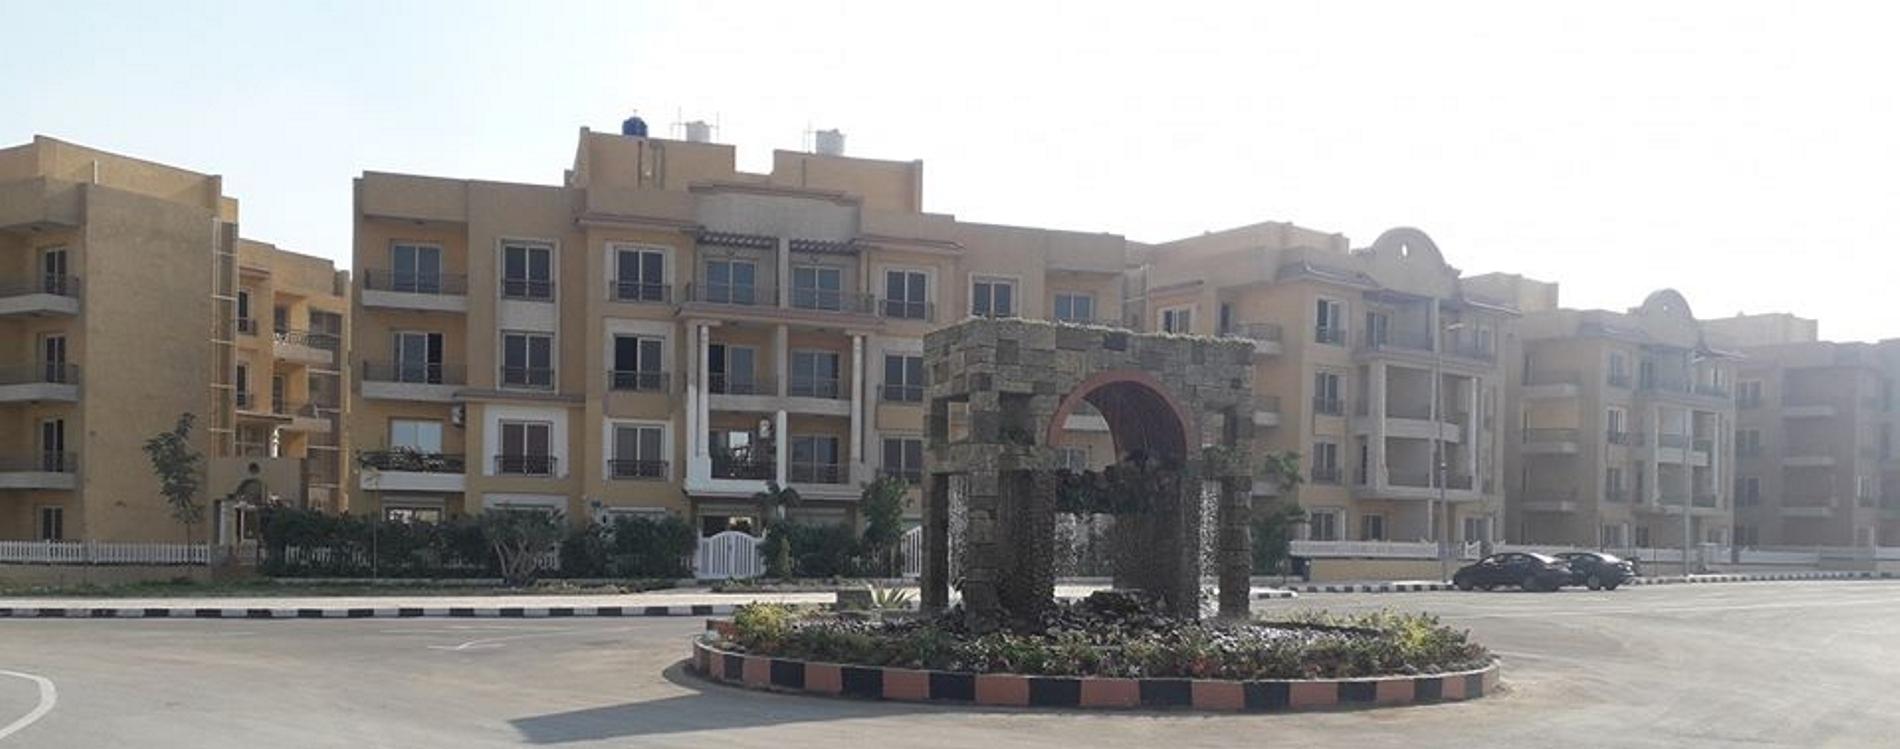 Africa Elkhmail Compound Egitto October City